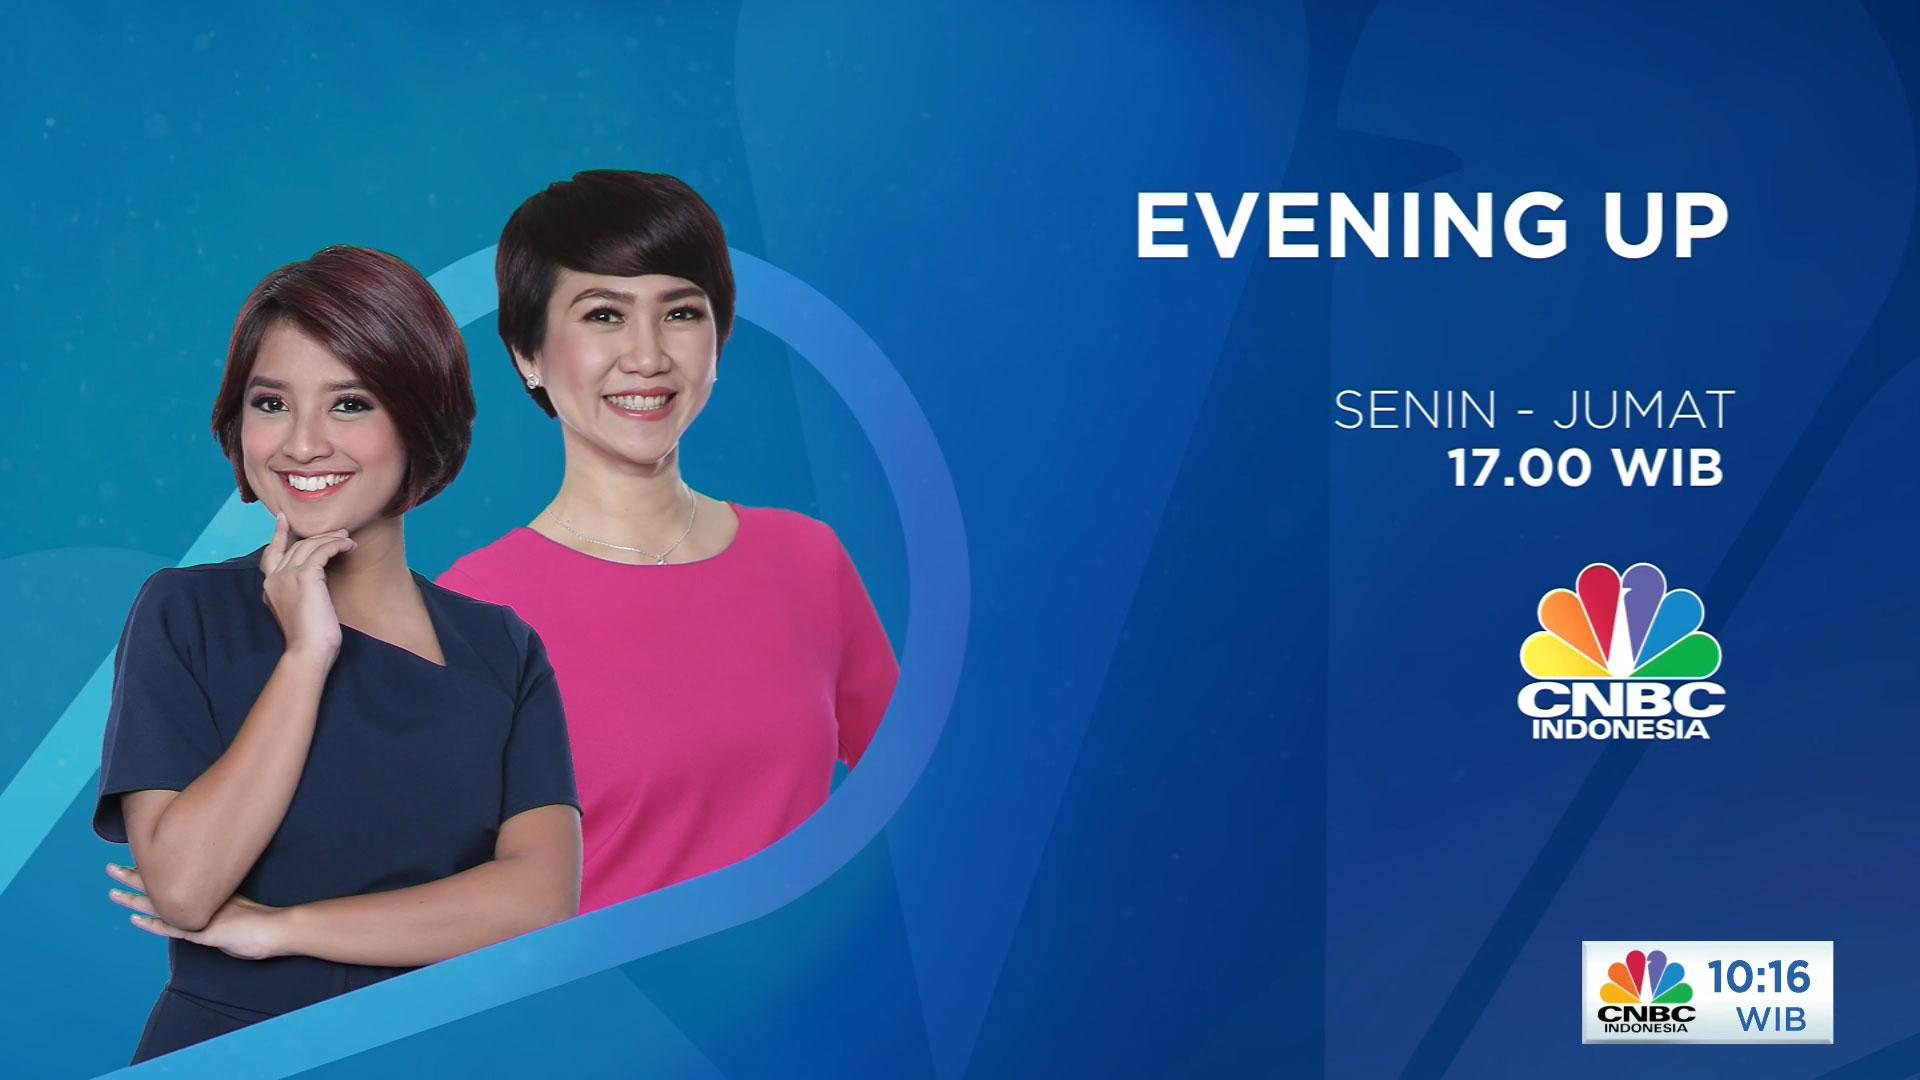 Frekuensi siaran CNBC Indonesia di satelit Telkom 4 Terbaru